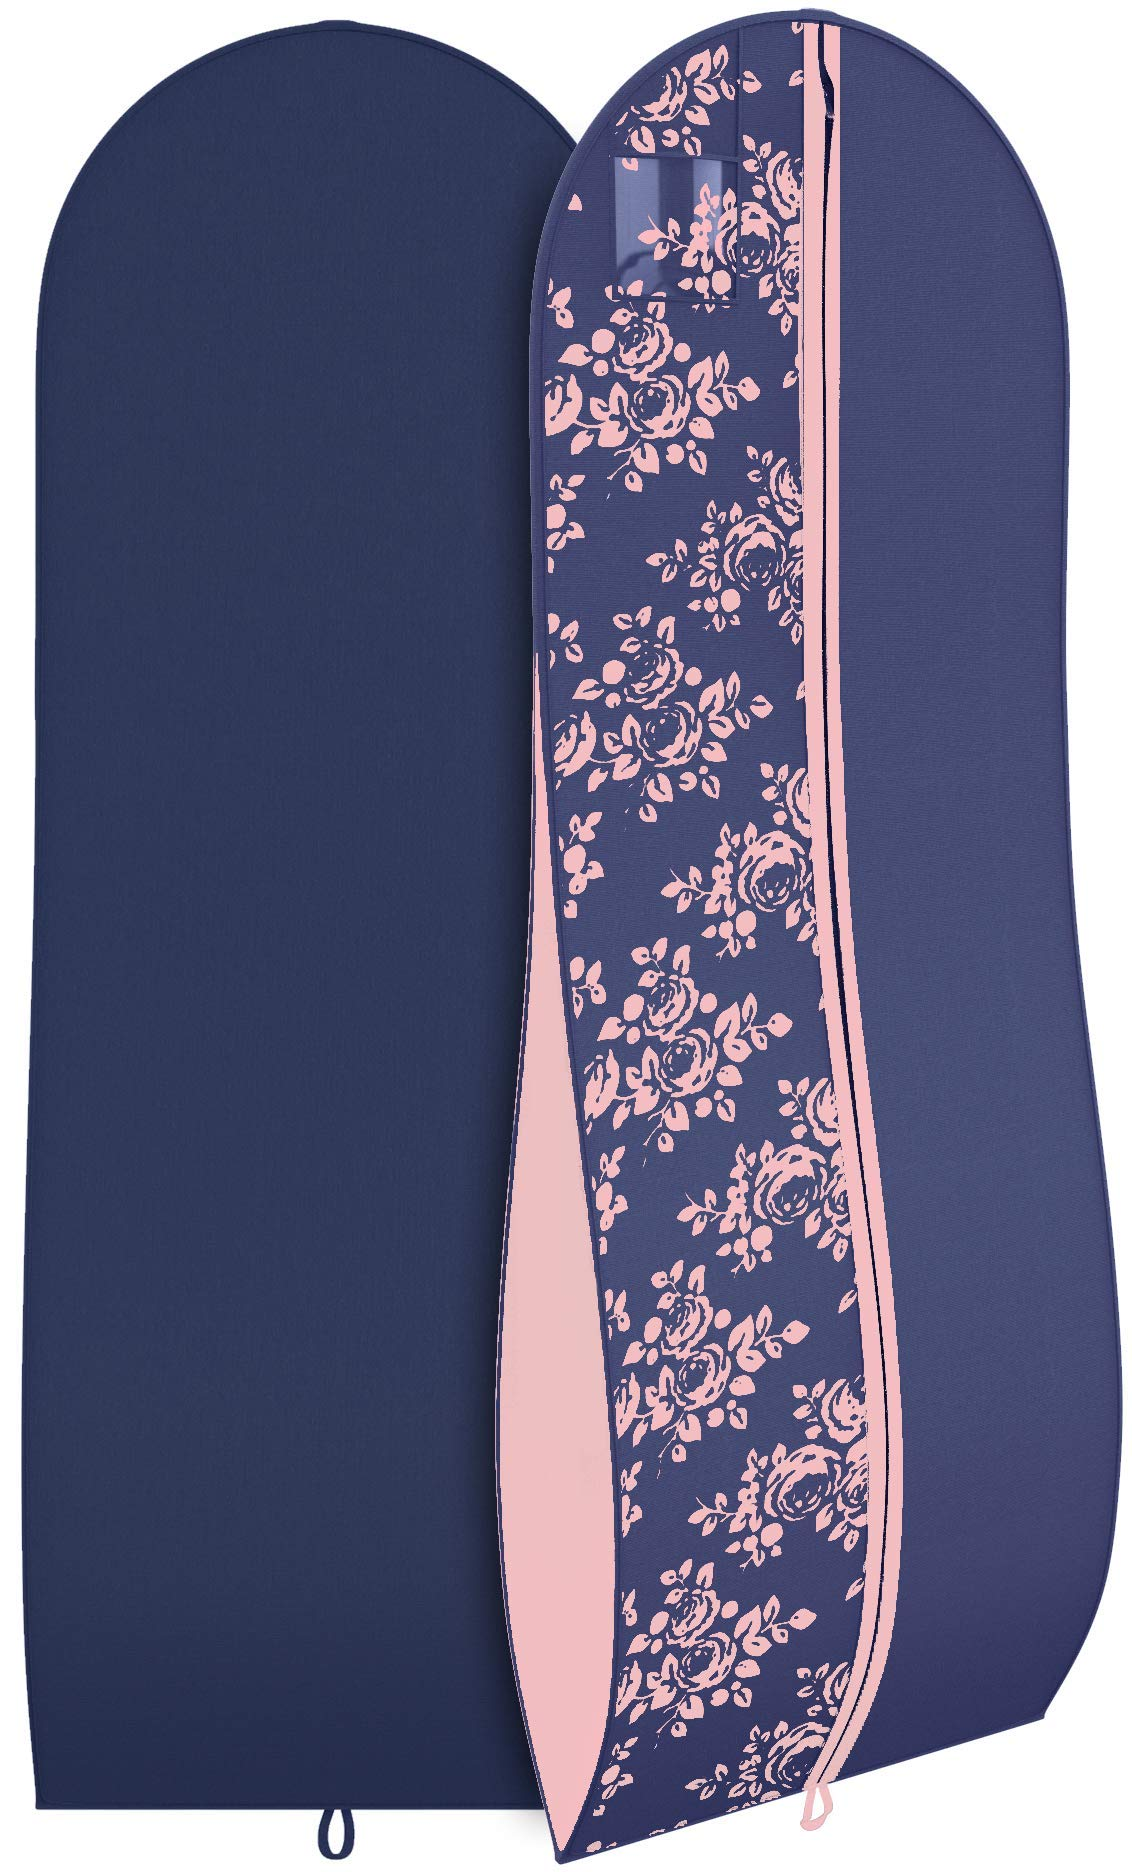 Women's Formal Gown Garment Bag -Long Wedding Prom Dresses - 72''x24'', 10'' Gusset